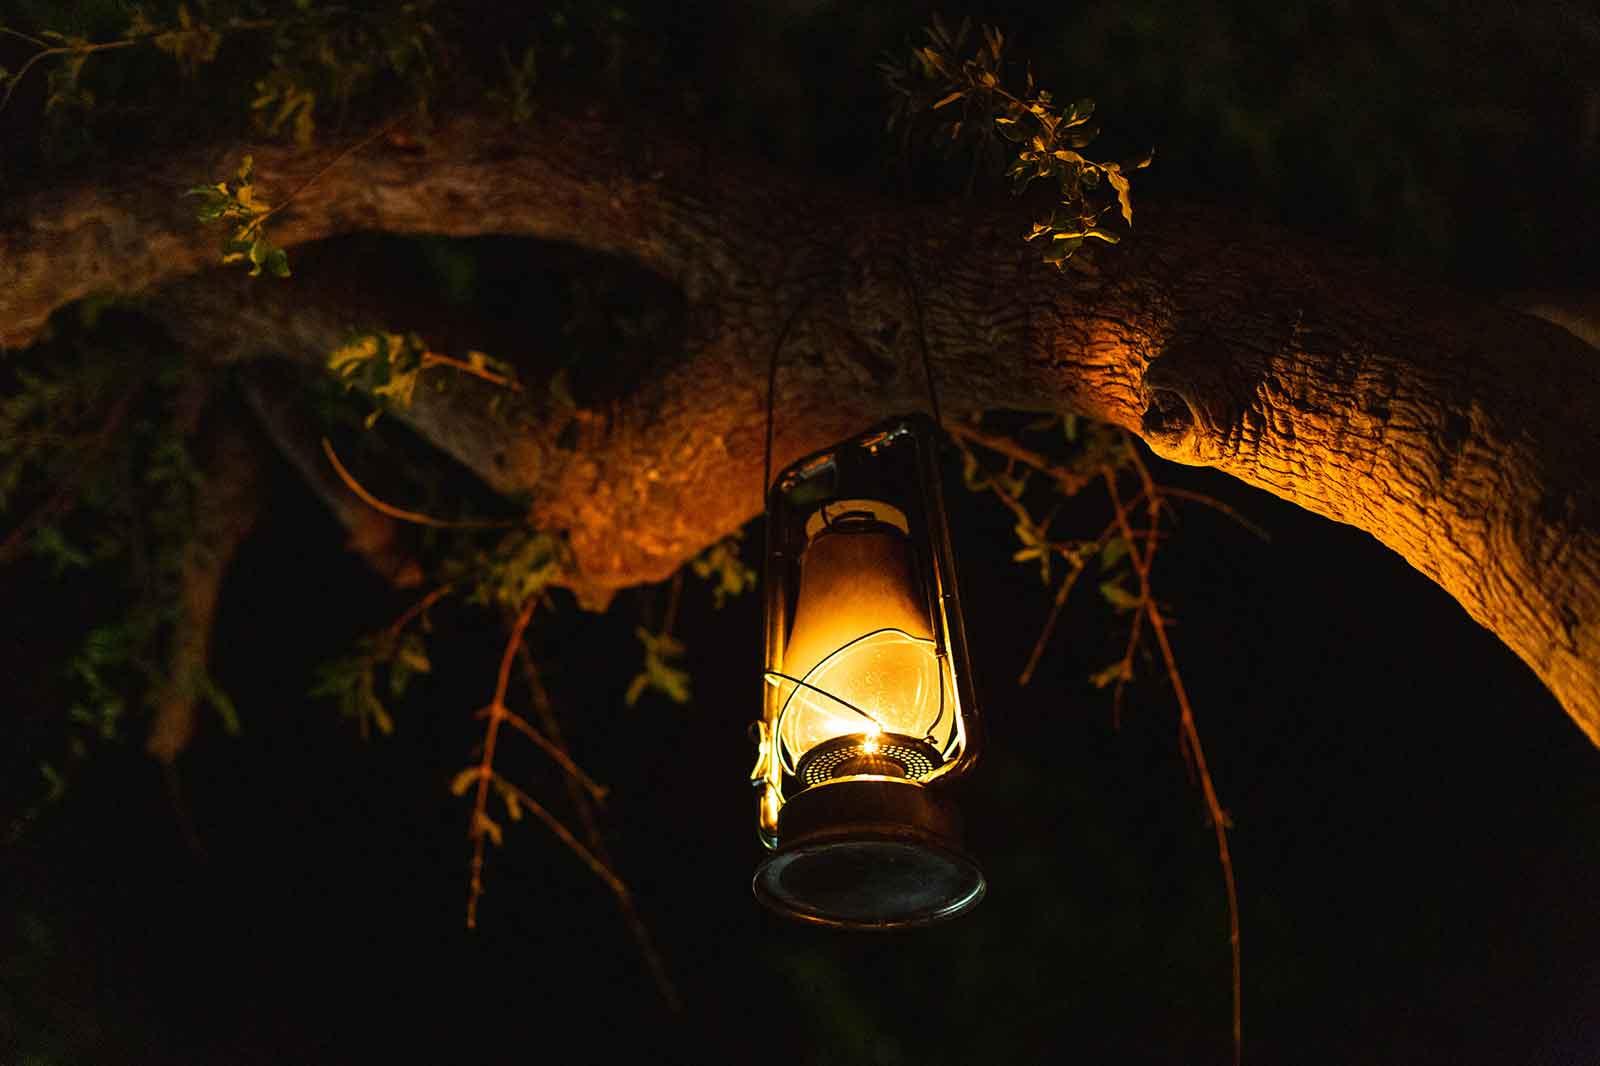 Motswiri Camp Lanterns